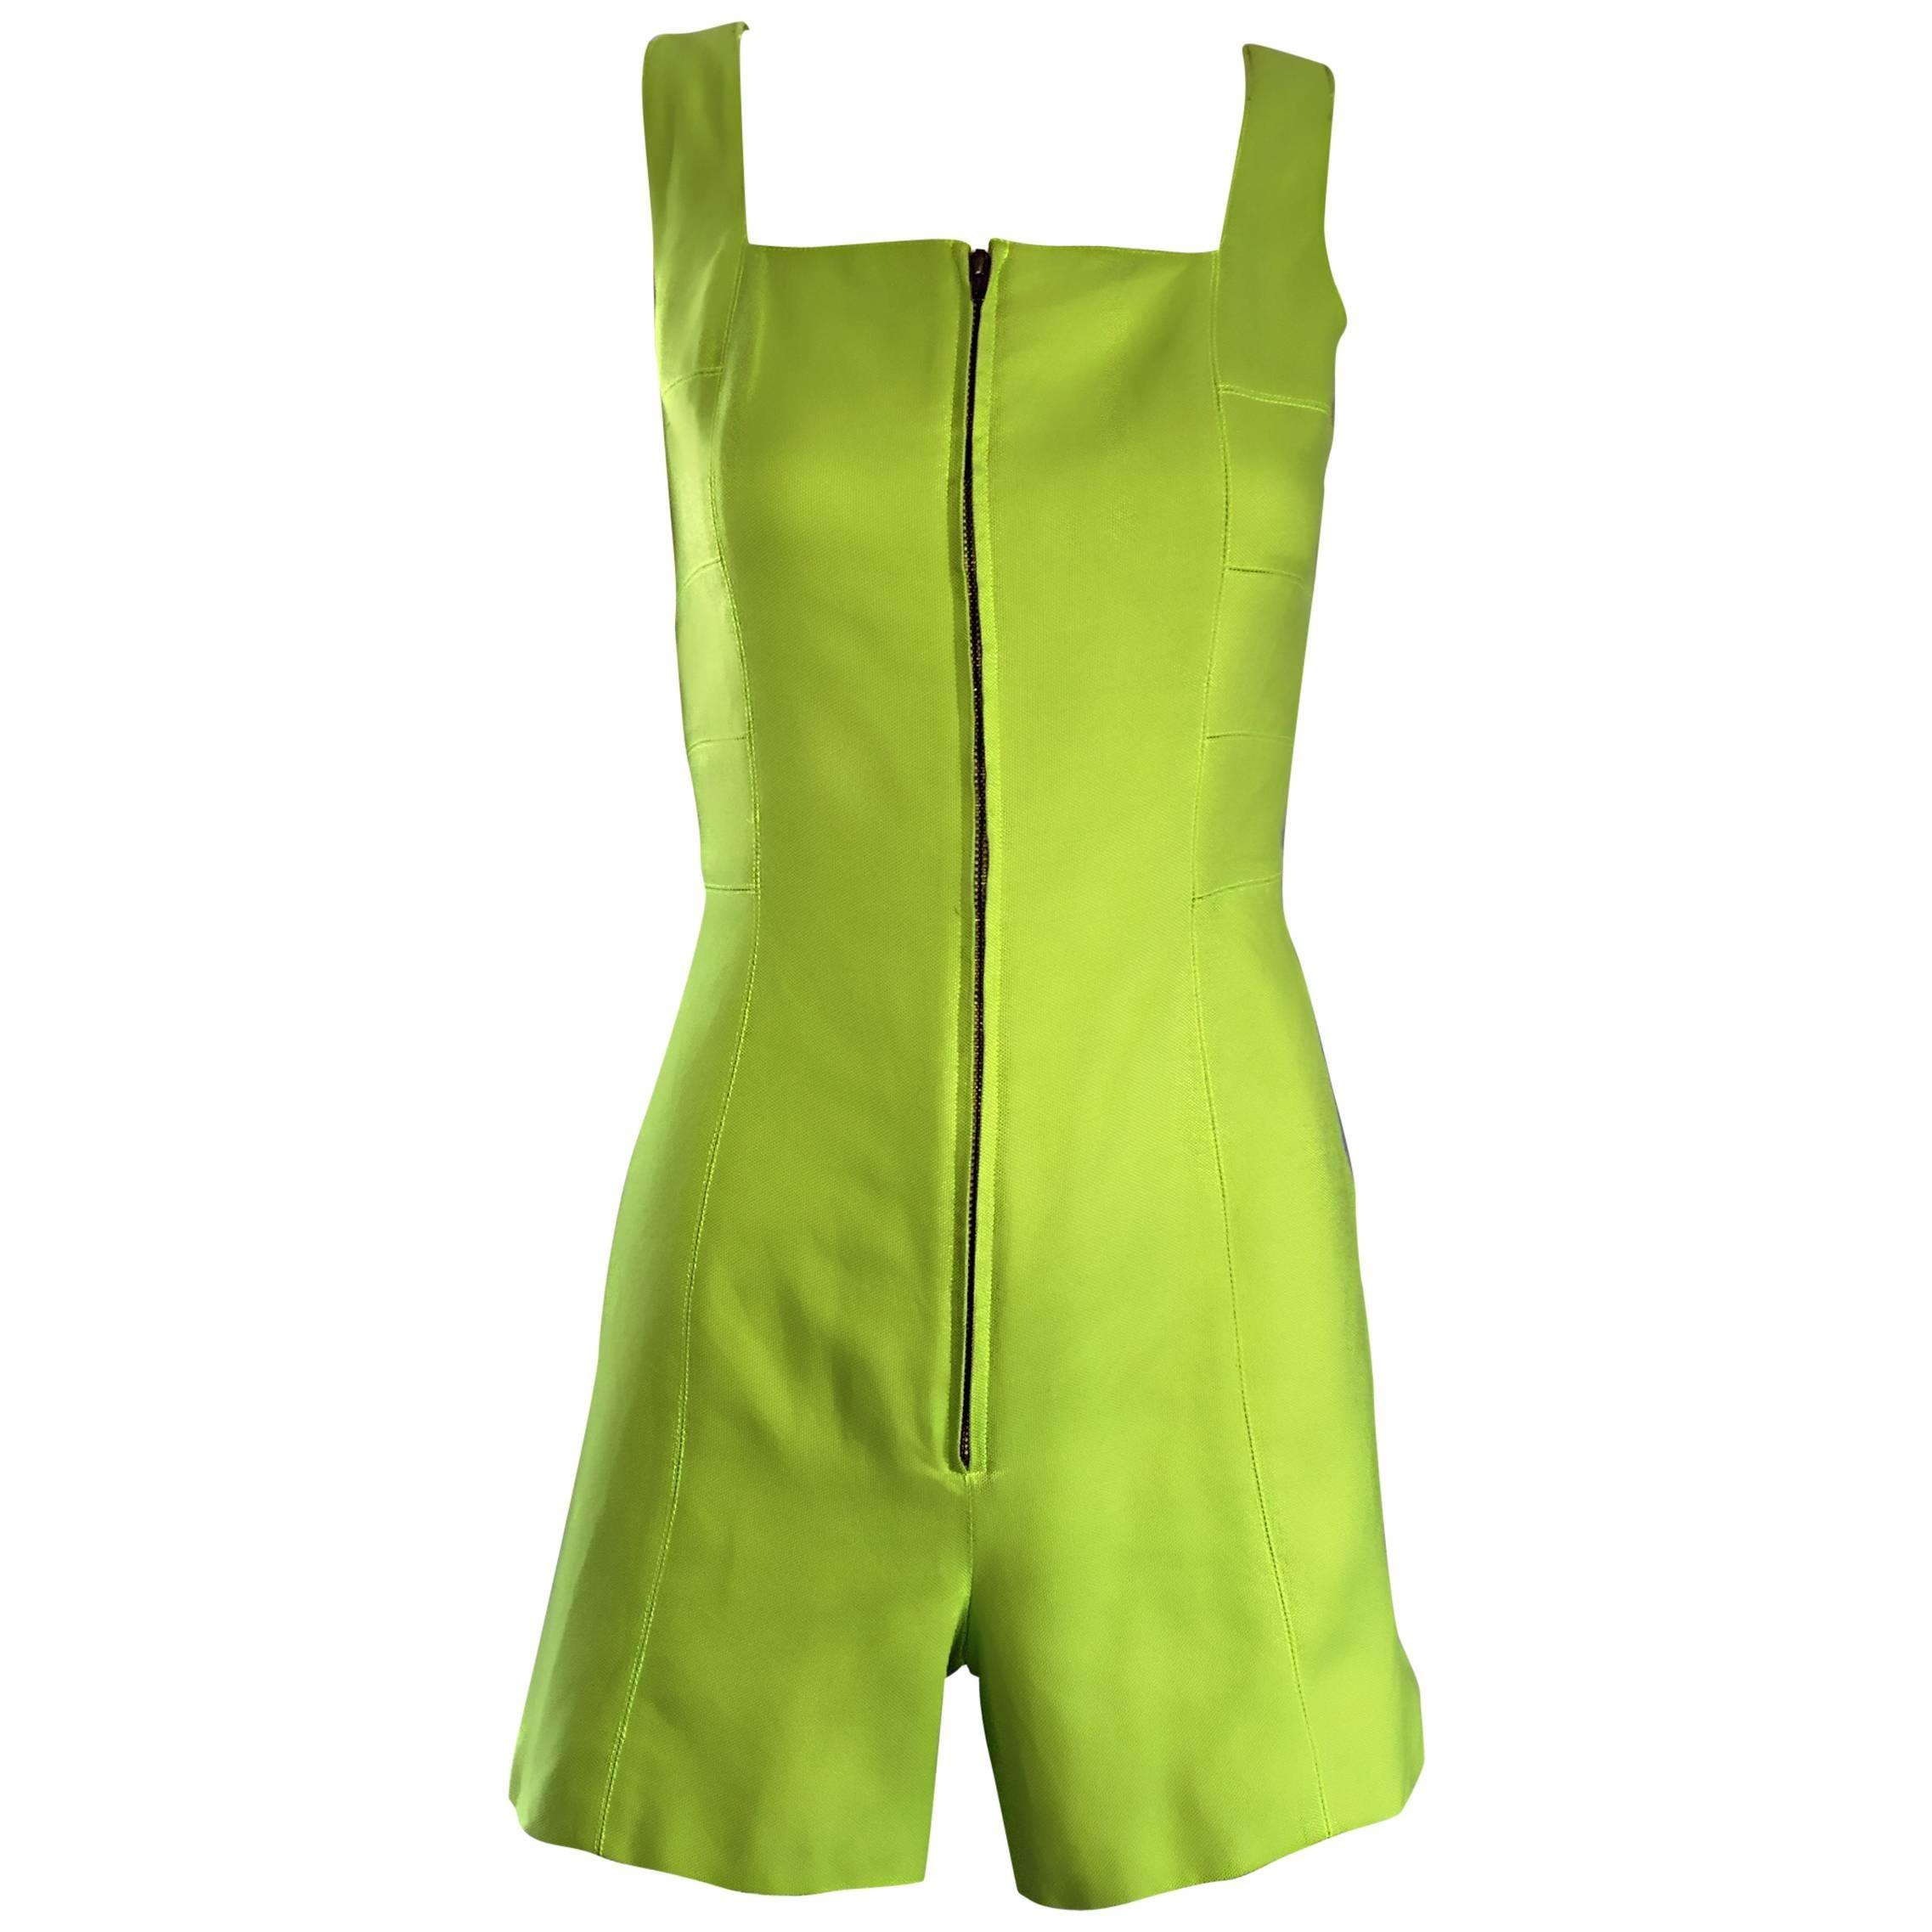 Rare Vintage Claude Montana Neon Green Linen + Cotton Romper Jumpsuit Onesie